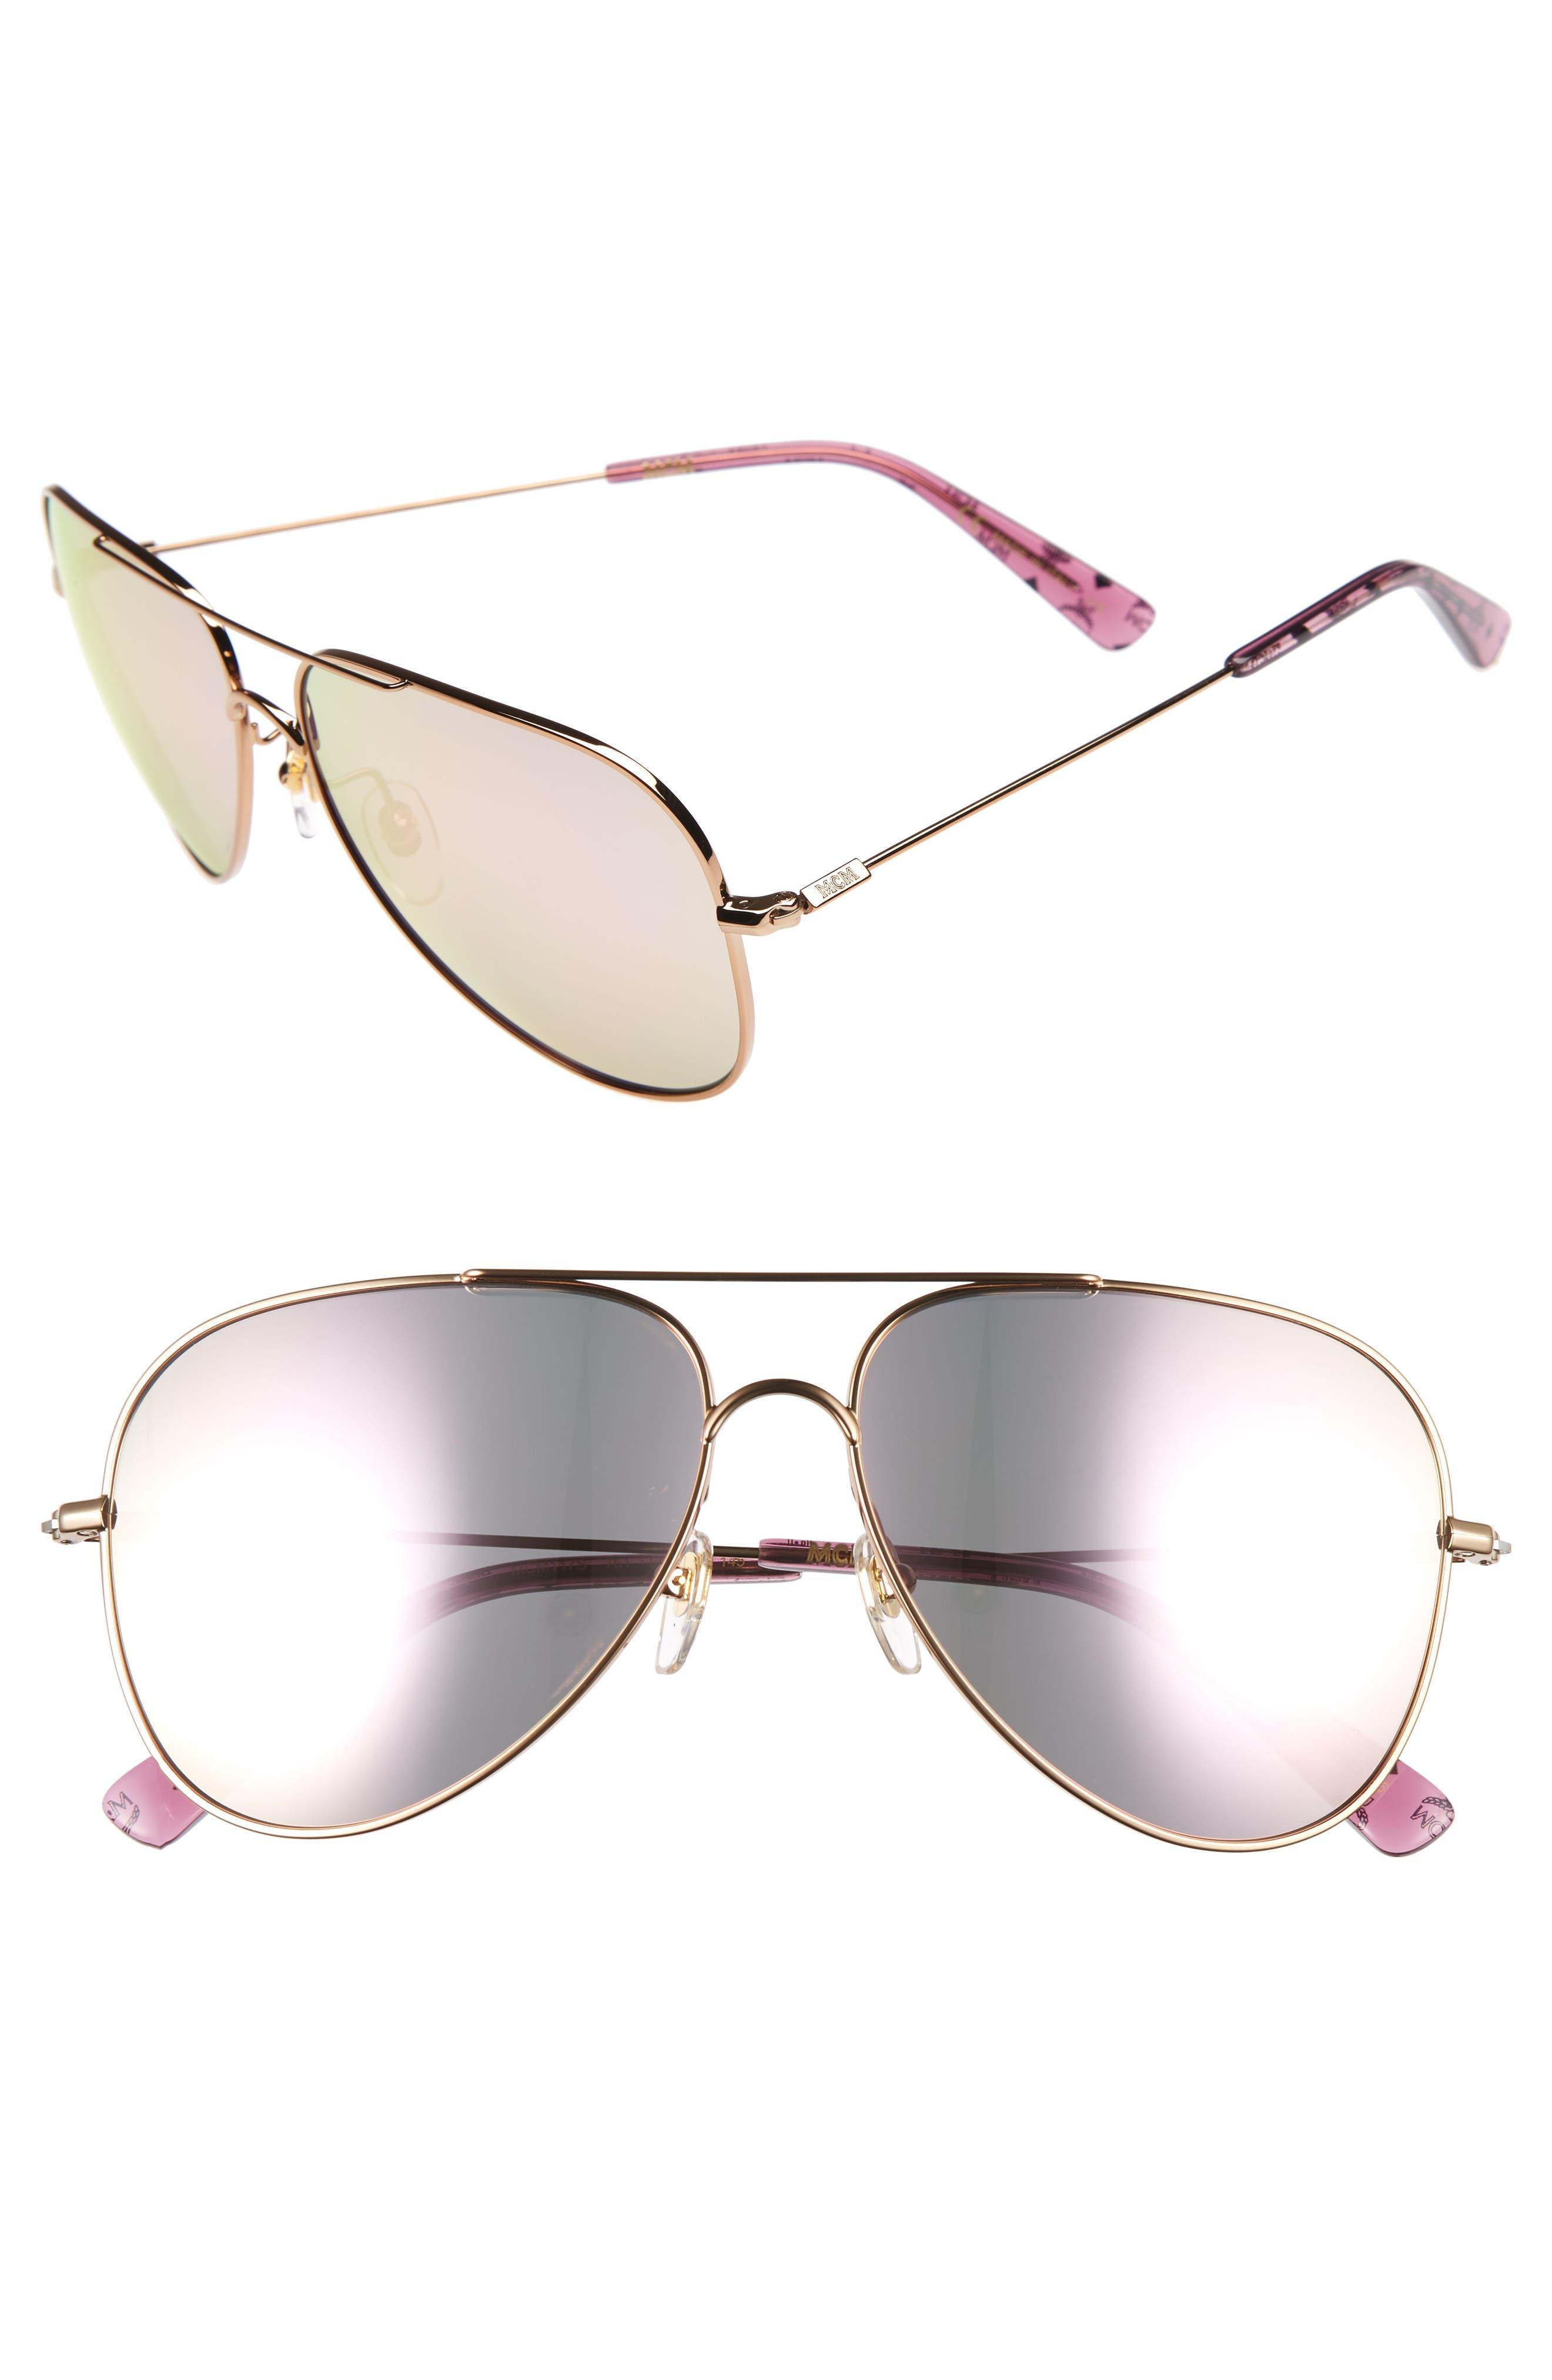 60mm Aviator Sunglasses,                             Main thumbnail 1, color,                             AMBER